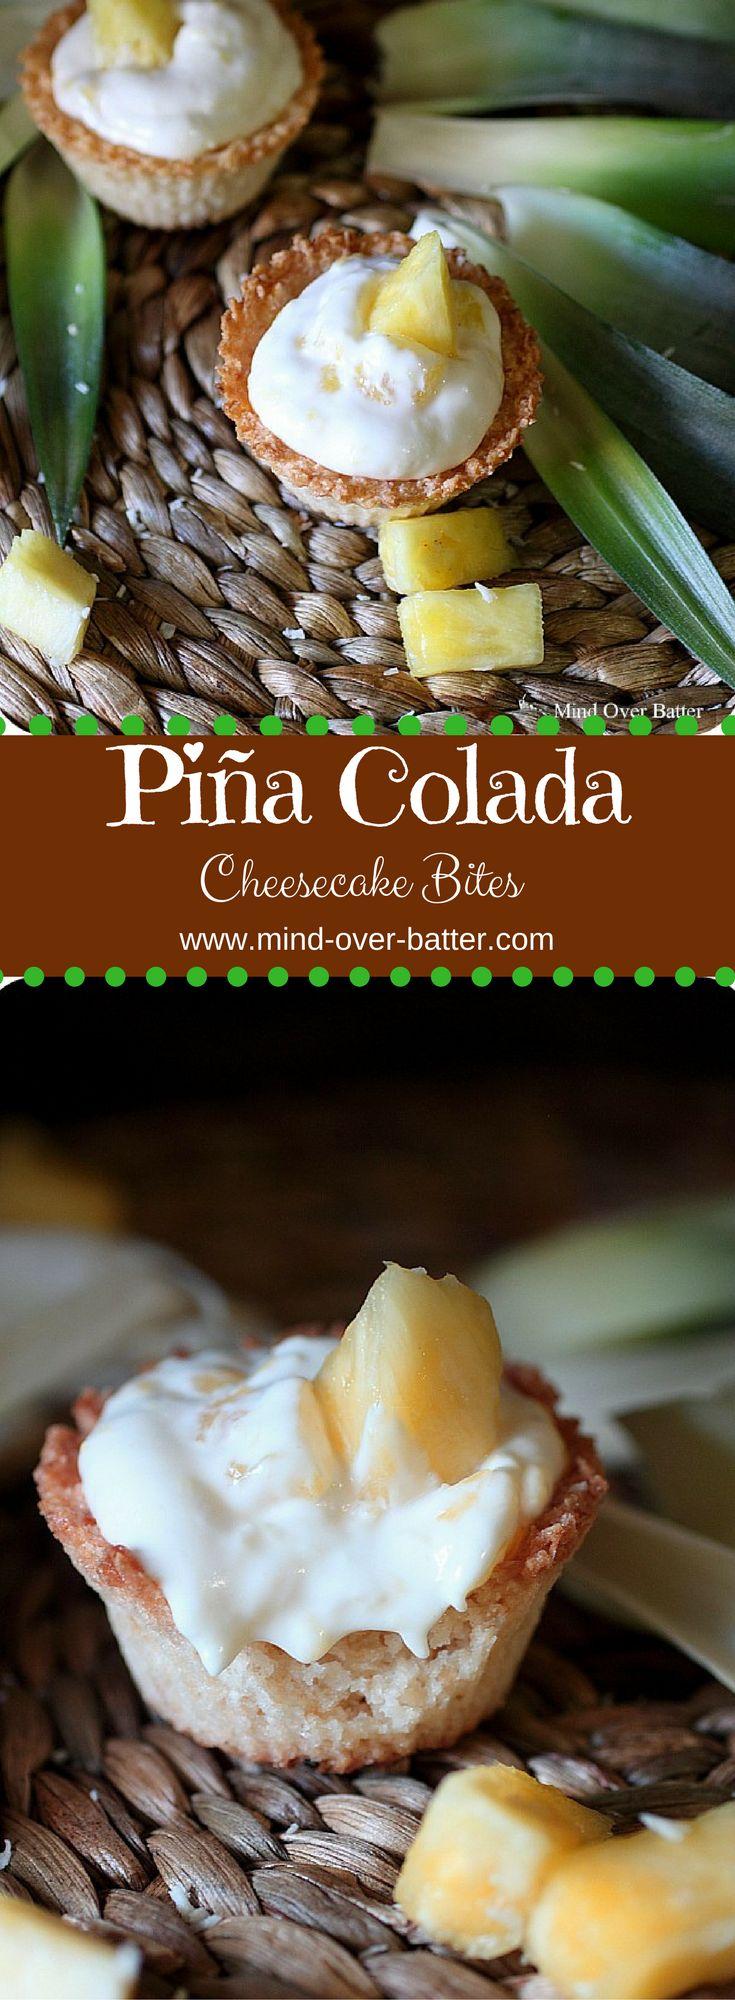 Half-Baked Piña Colada Cheesecake Bites